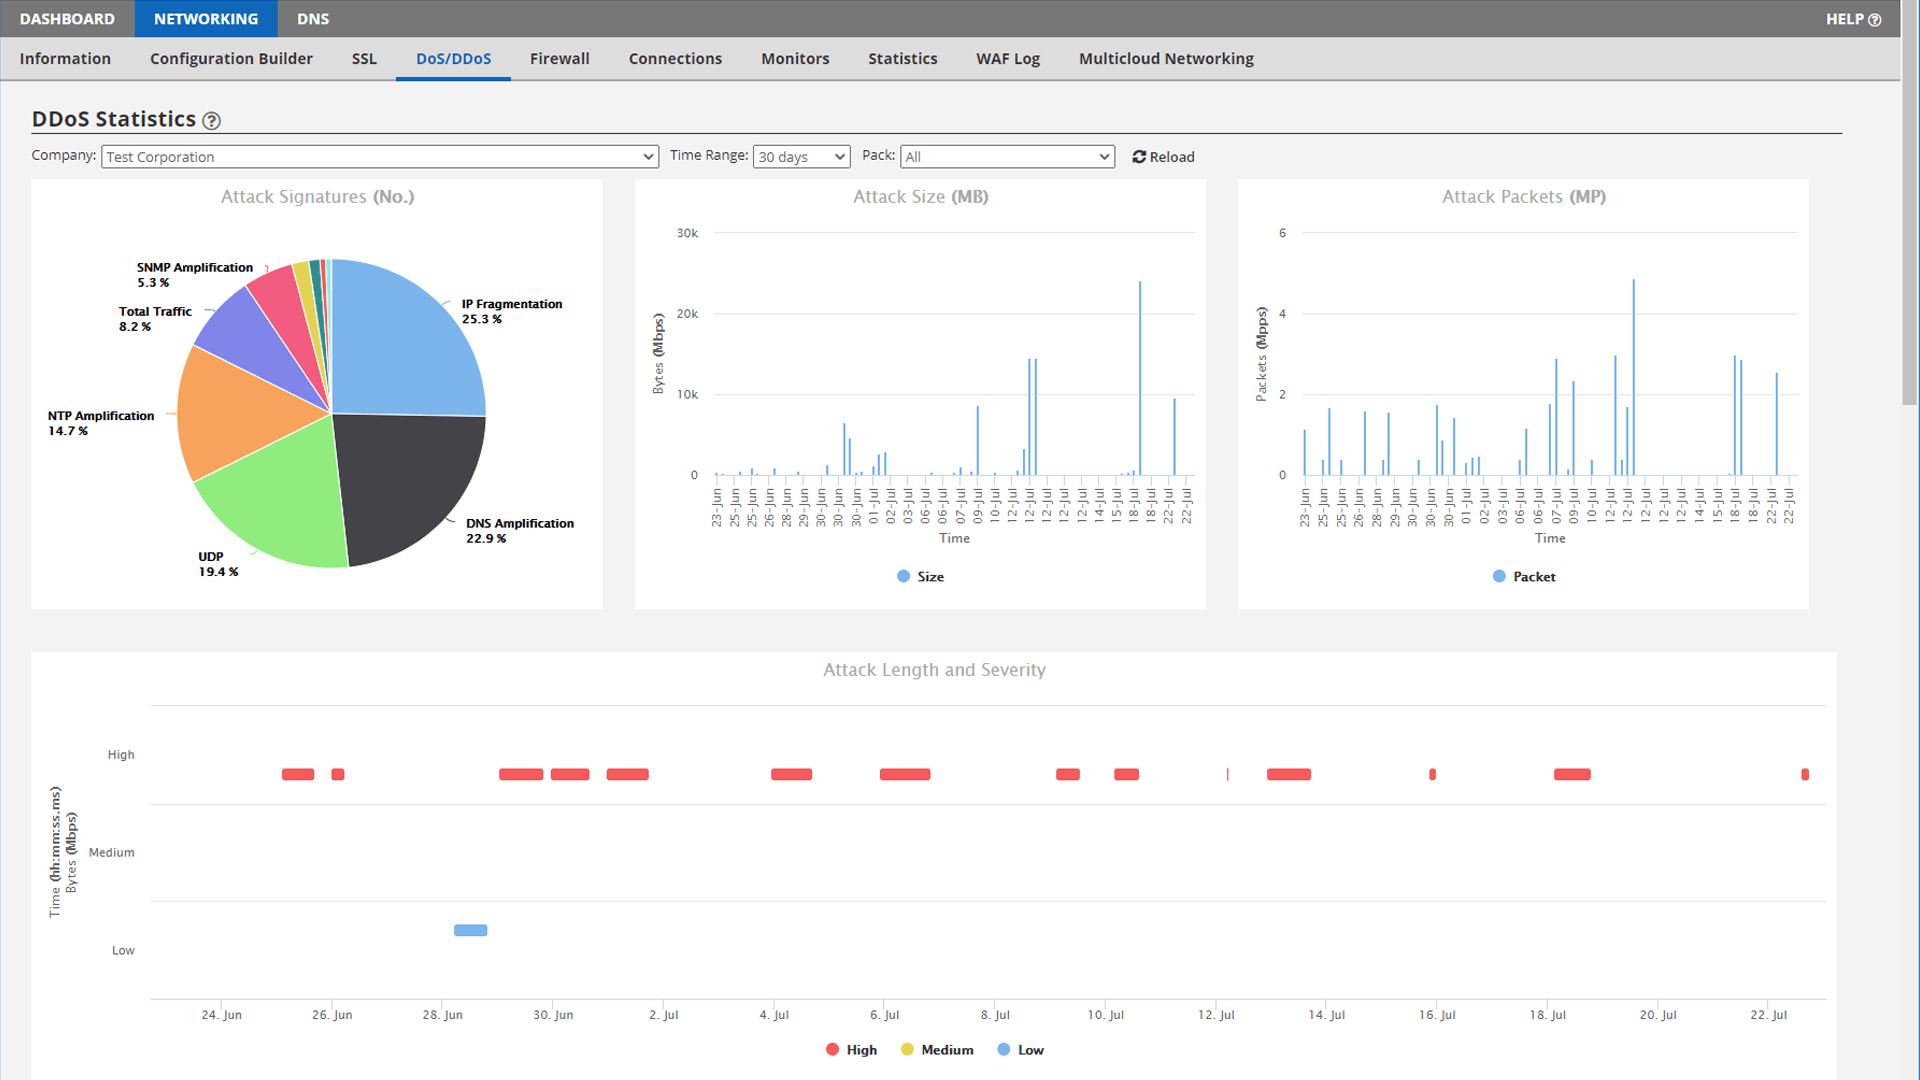 DDoS Statistics Tab